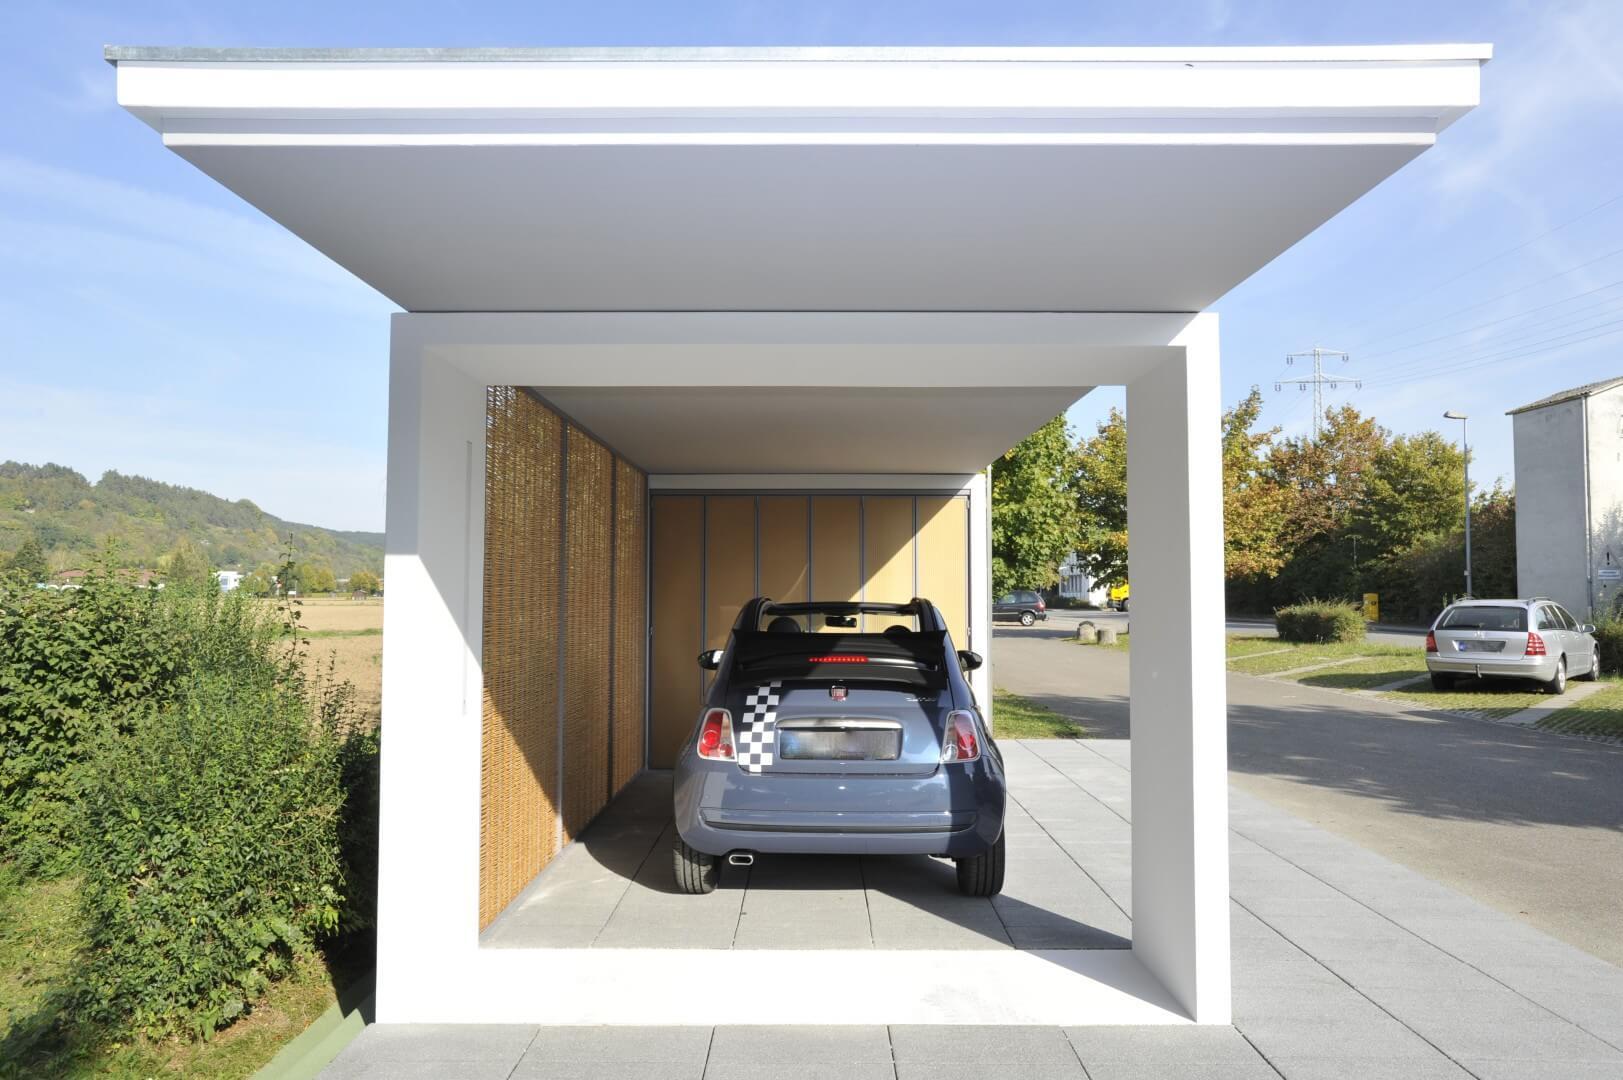 Kport garagen programm - Garage volkswagen saint cloud ...